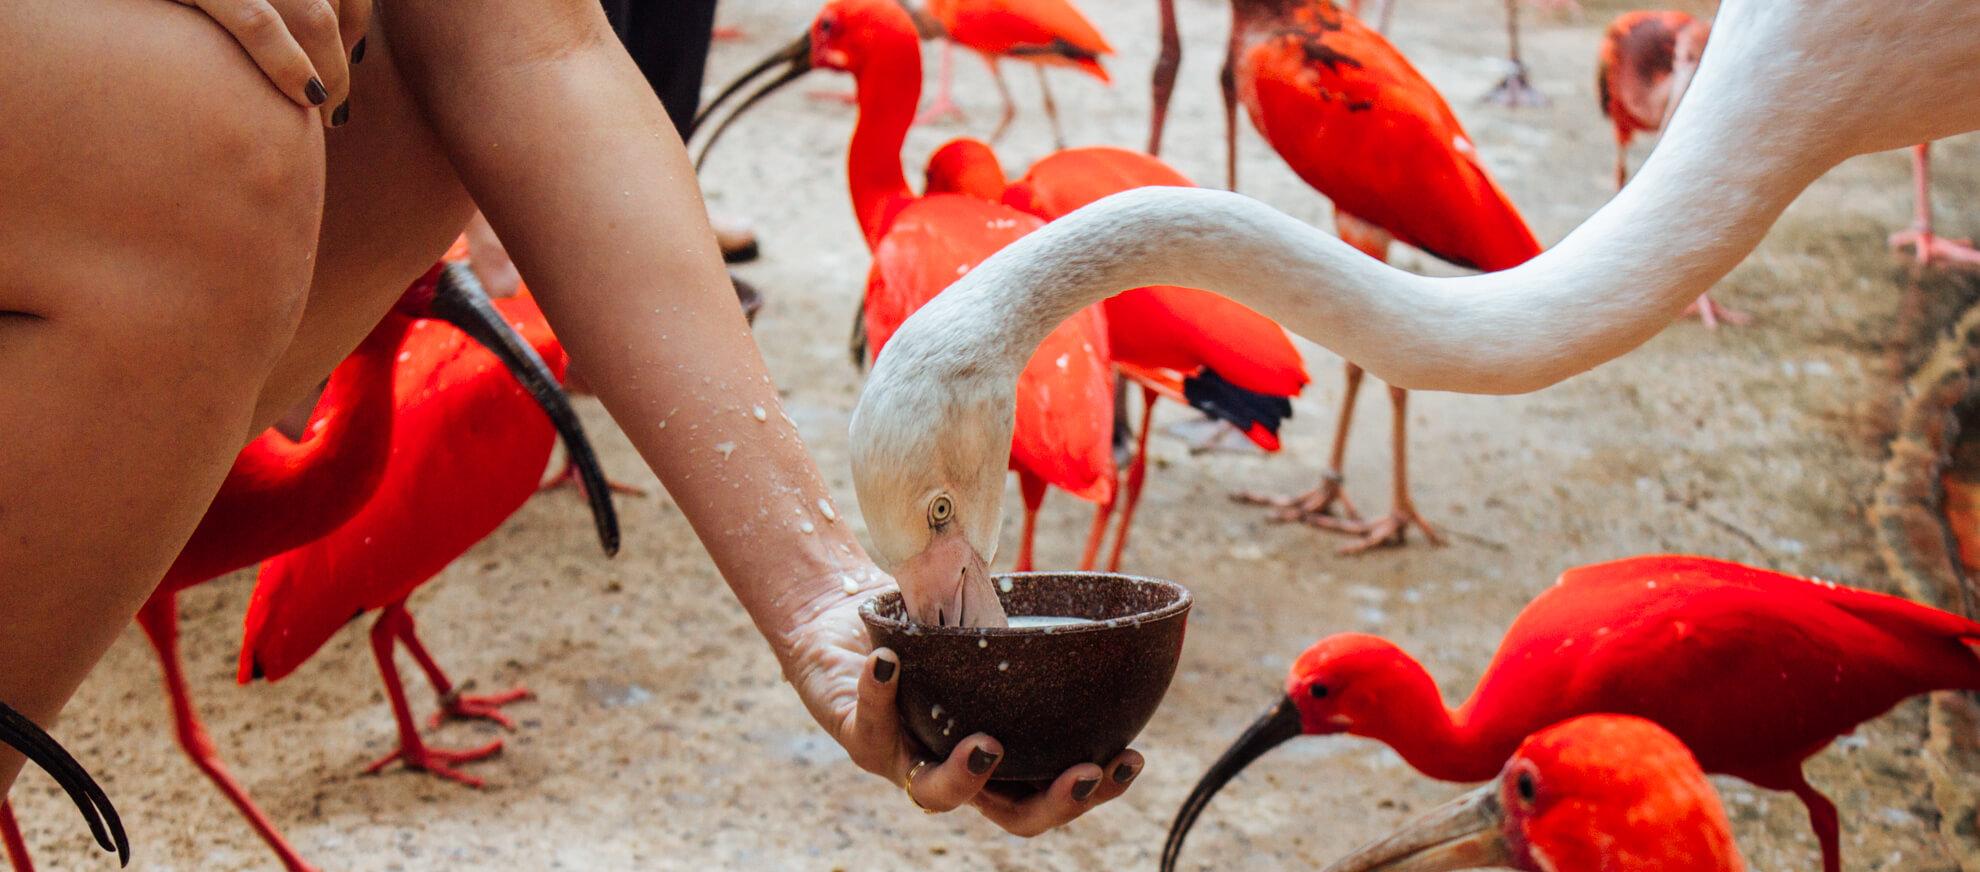 Alimentando flamingos e guarás, Backstage Experience, Parque das Aves